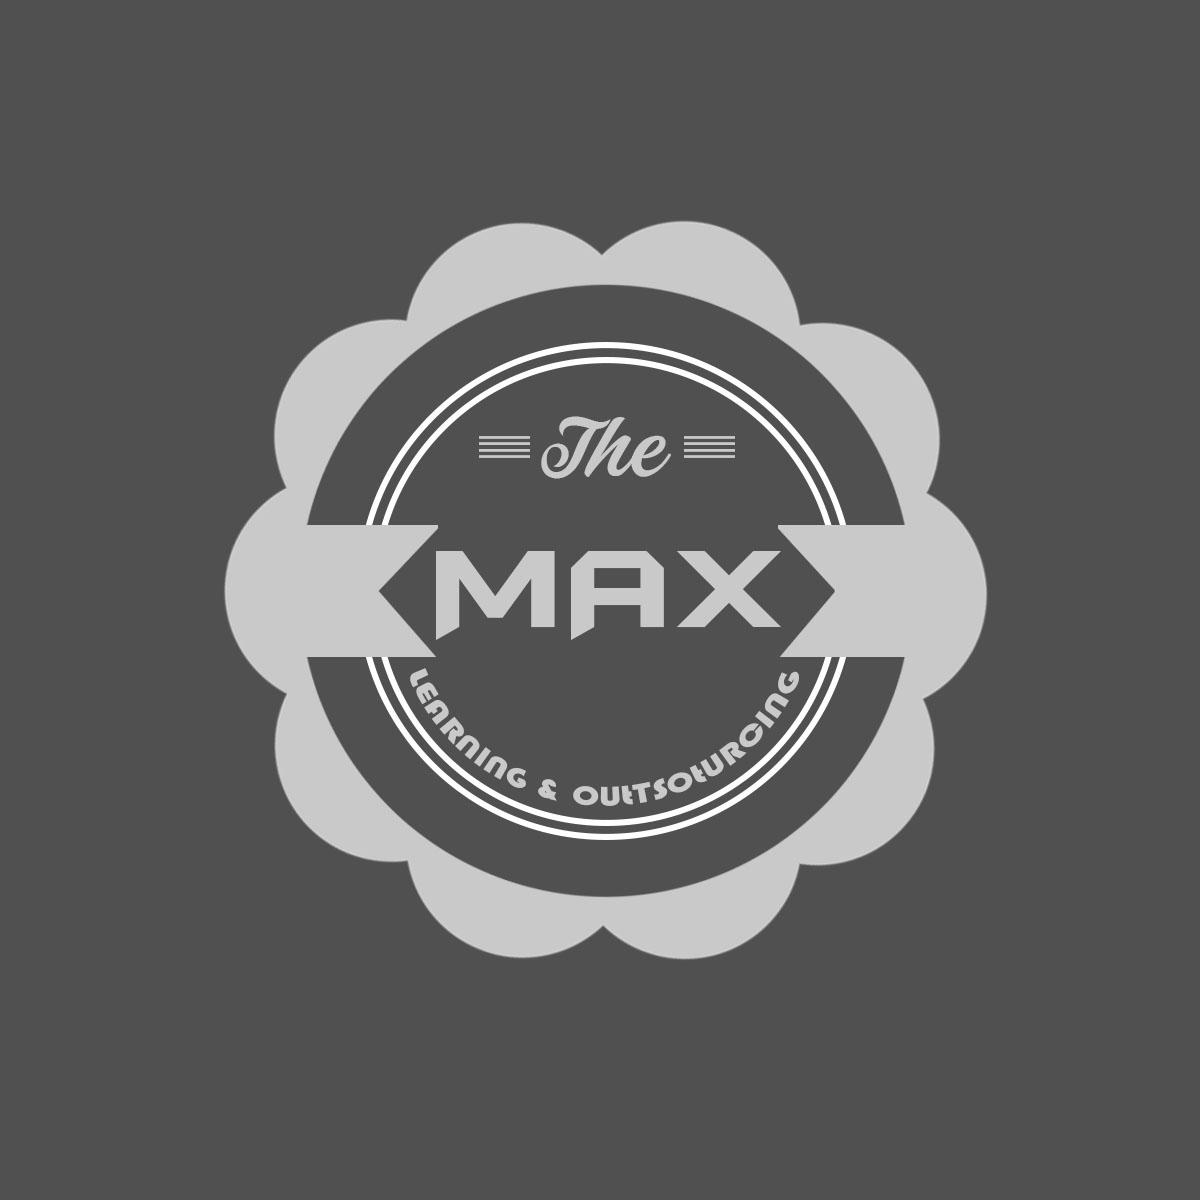 create, edit static and animated logo professionally